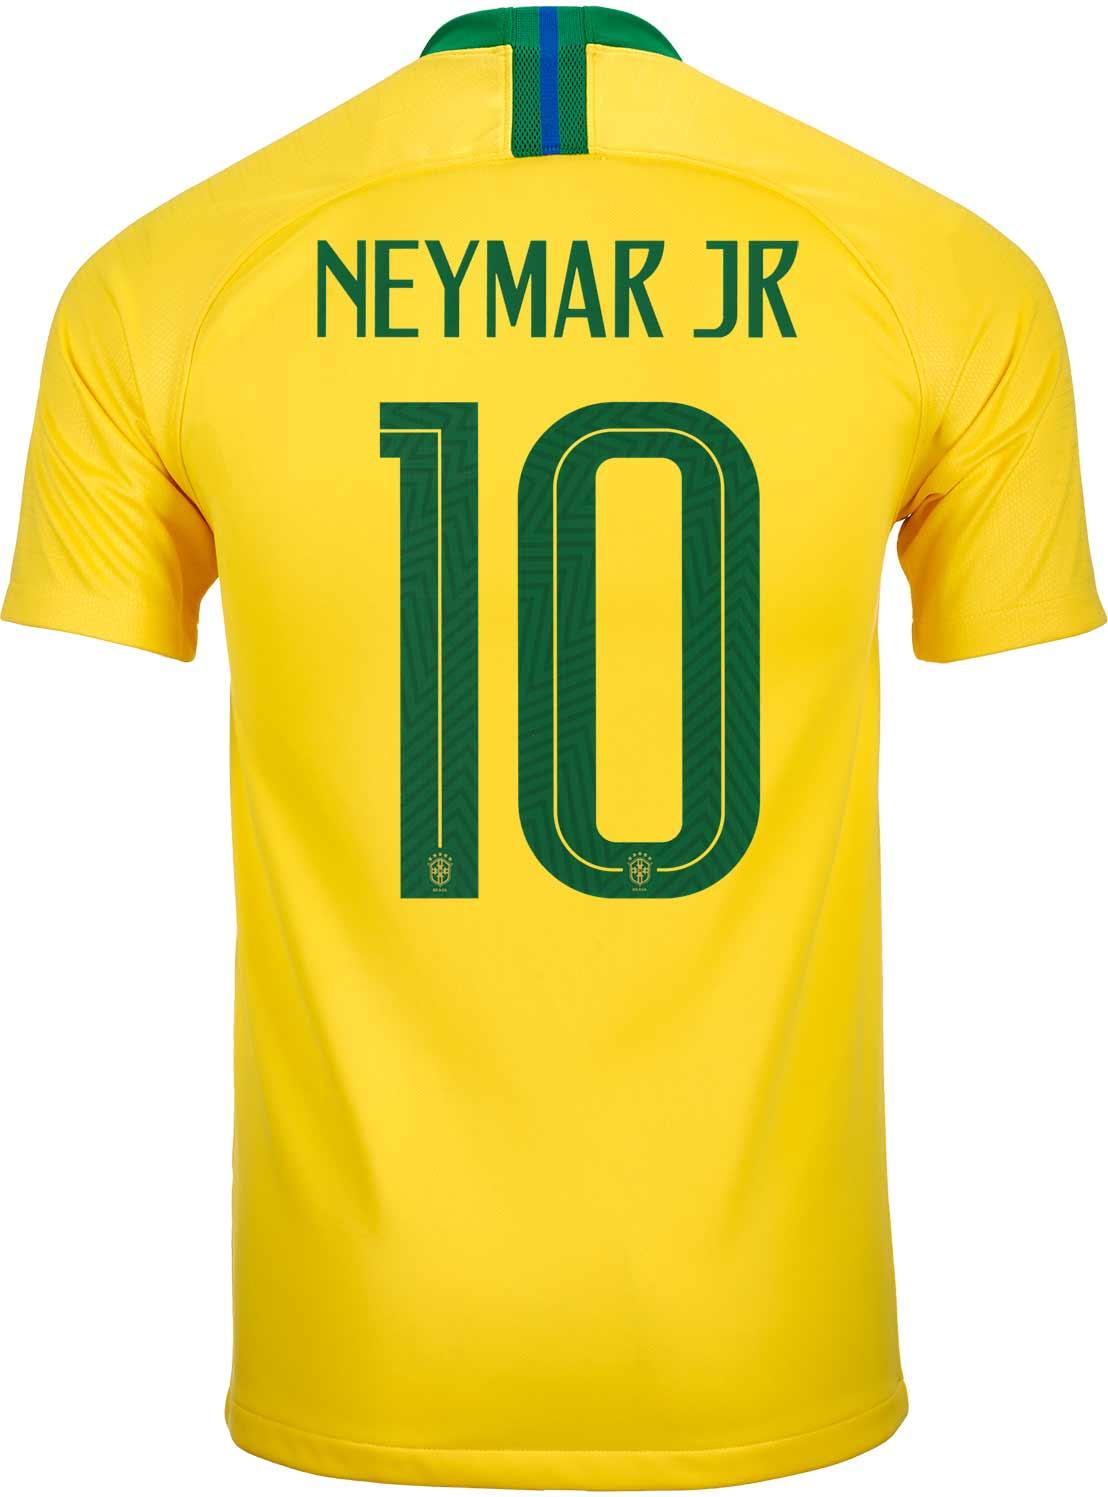 bf258a08673 2018 19 Kids Nike Neymar Jr Brazil Home Jersey - SoccerPro